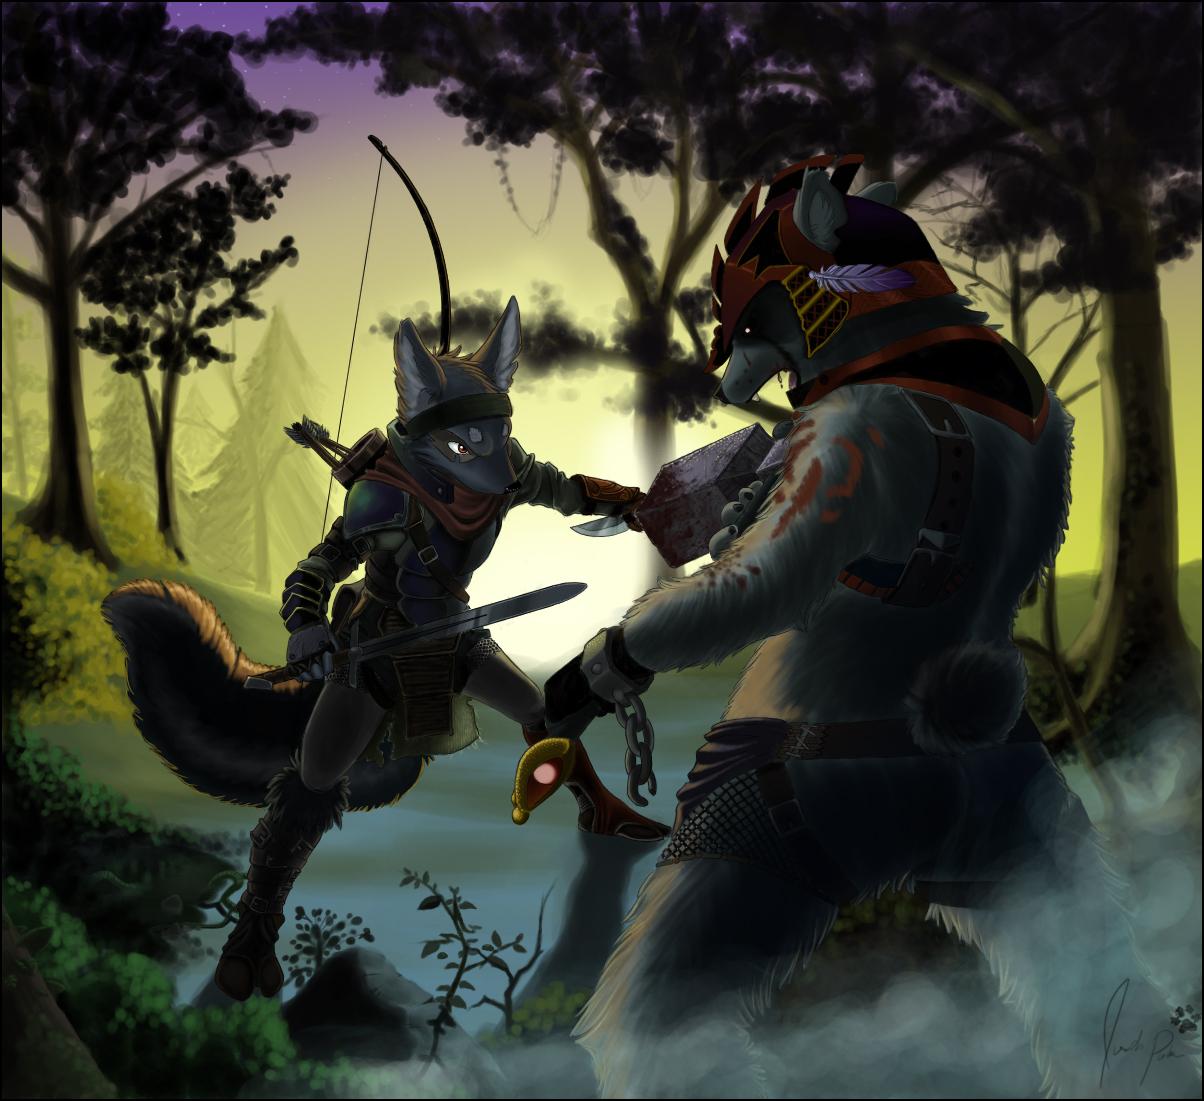 Battle at Dawn